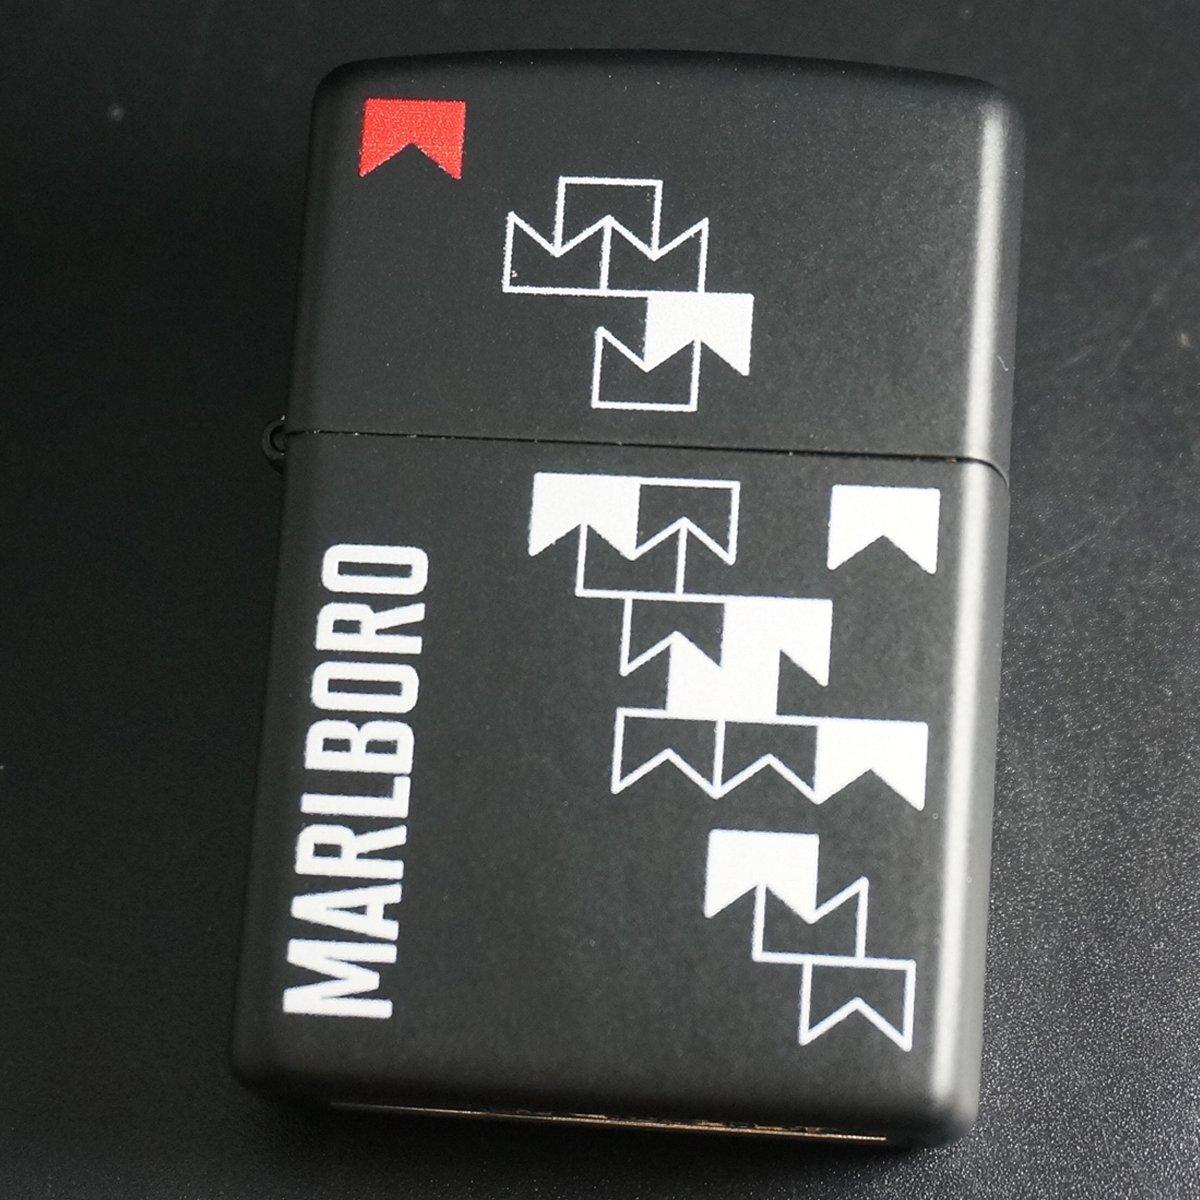 zippo Marlboro 黒マット 2012年製造 B07226HPDJ